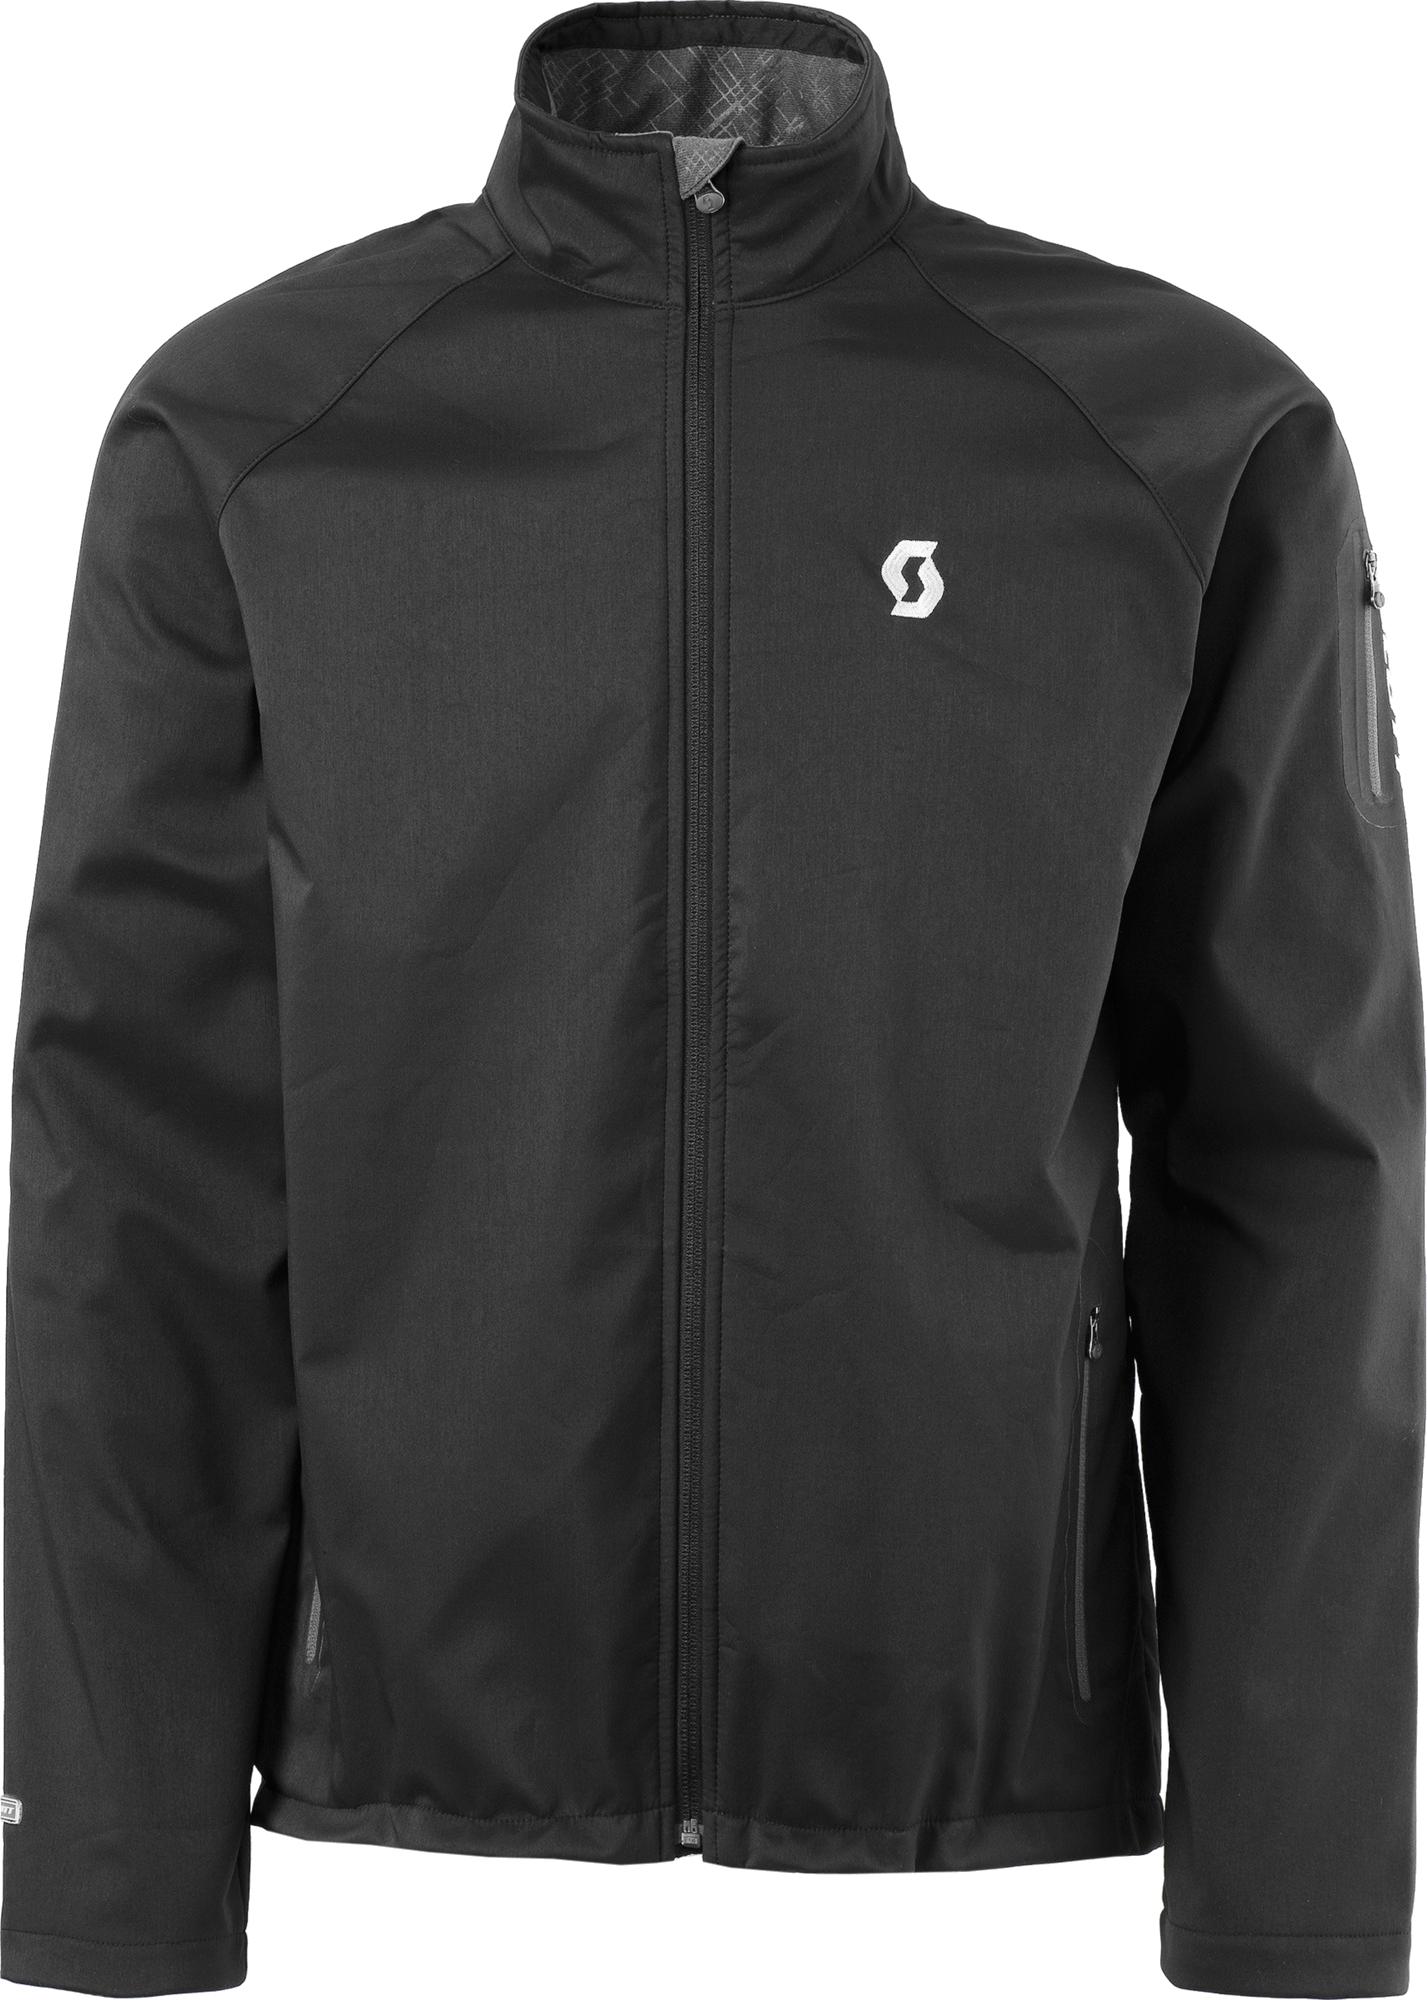 Black Jacket | Gommap Blog